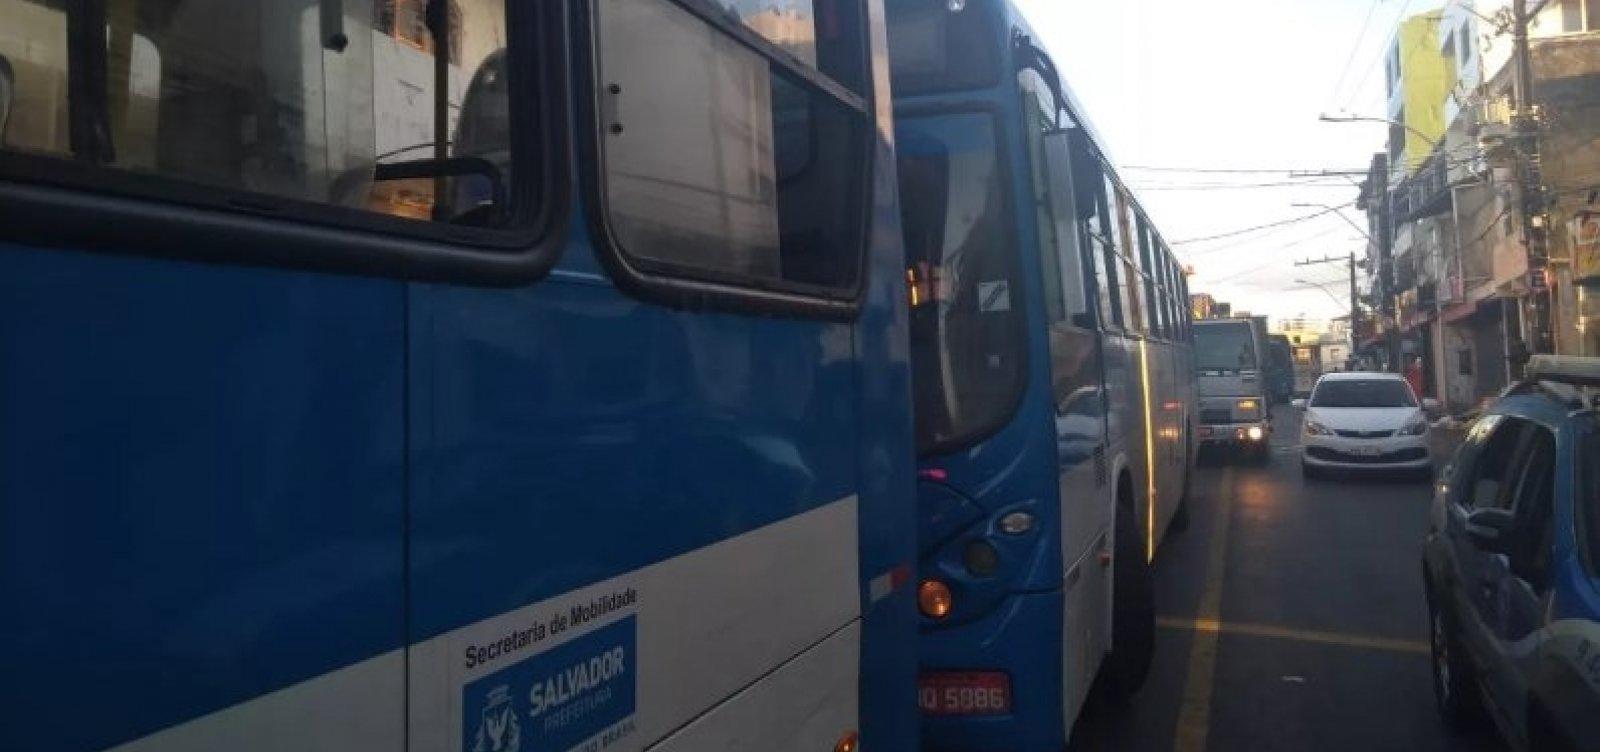 [Após morte de suspeito, ônibus voltam a circular no bairro da Santa Cruz]